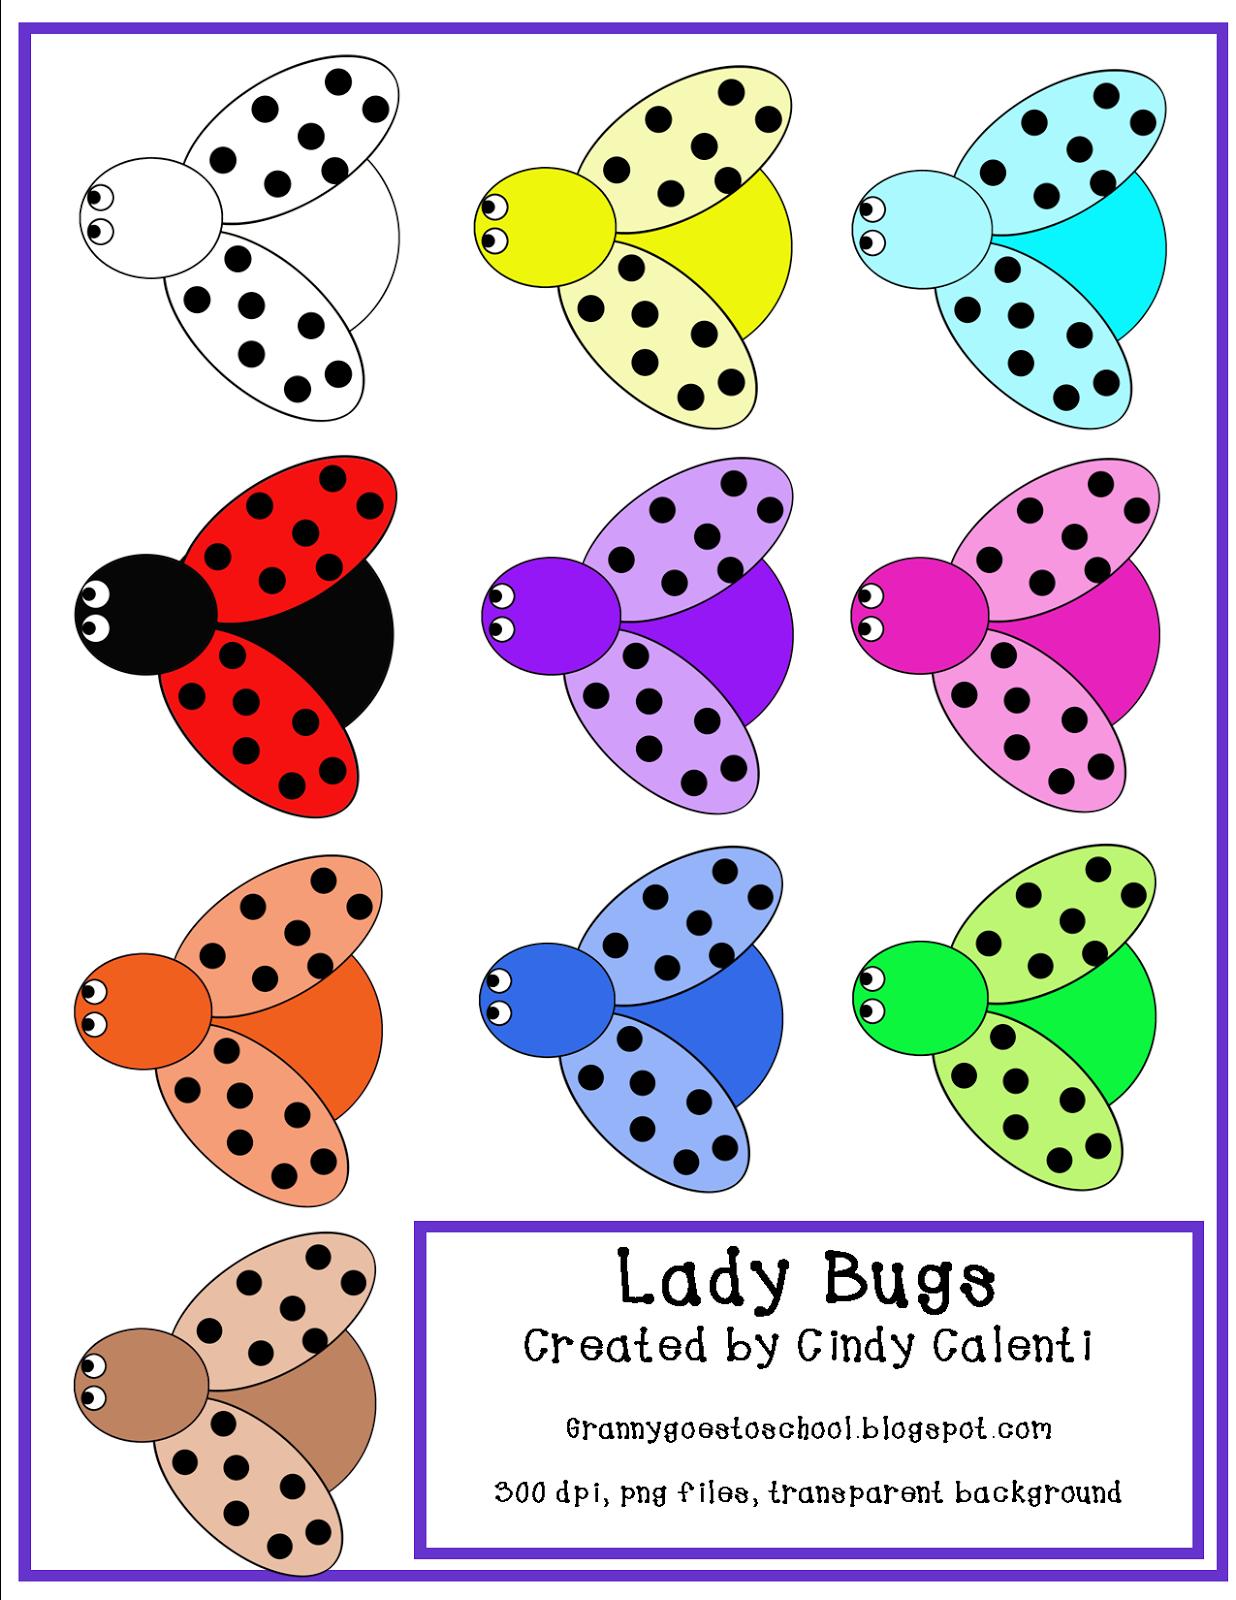 http://grannygoestoschool.blogspot.com/2014/08/lady-bugs-freeie.html